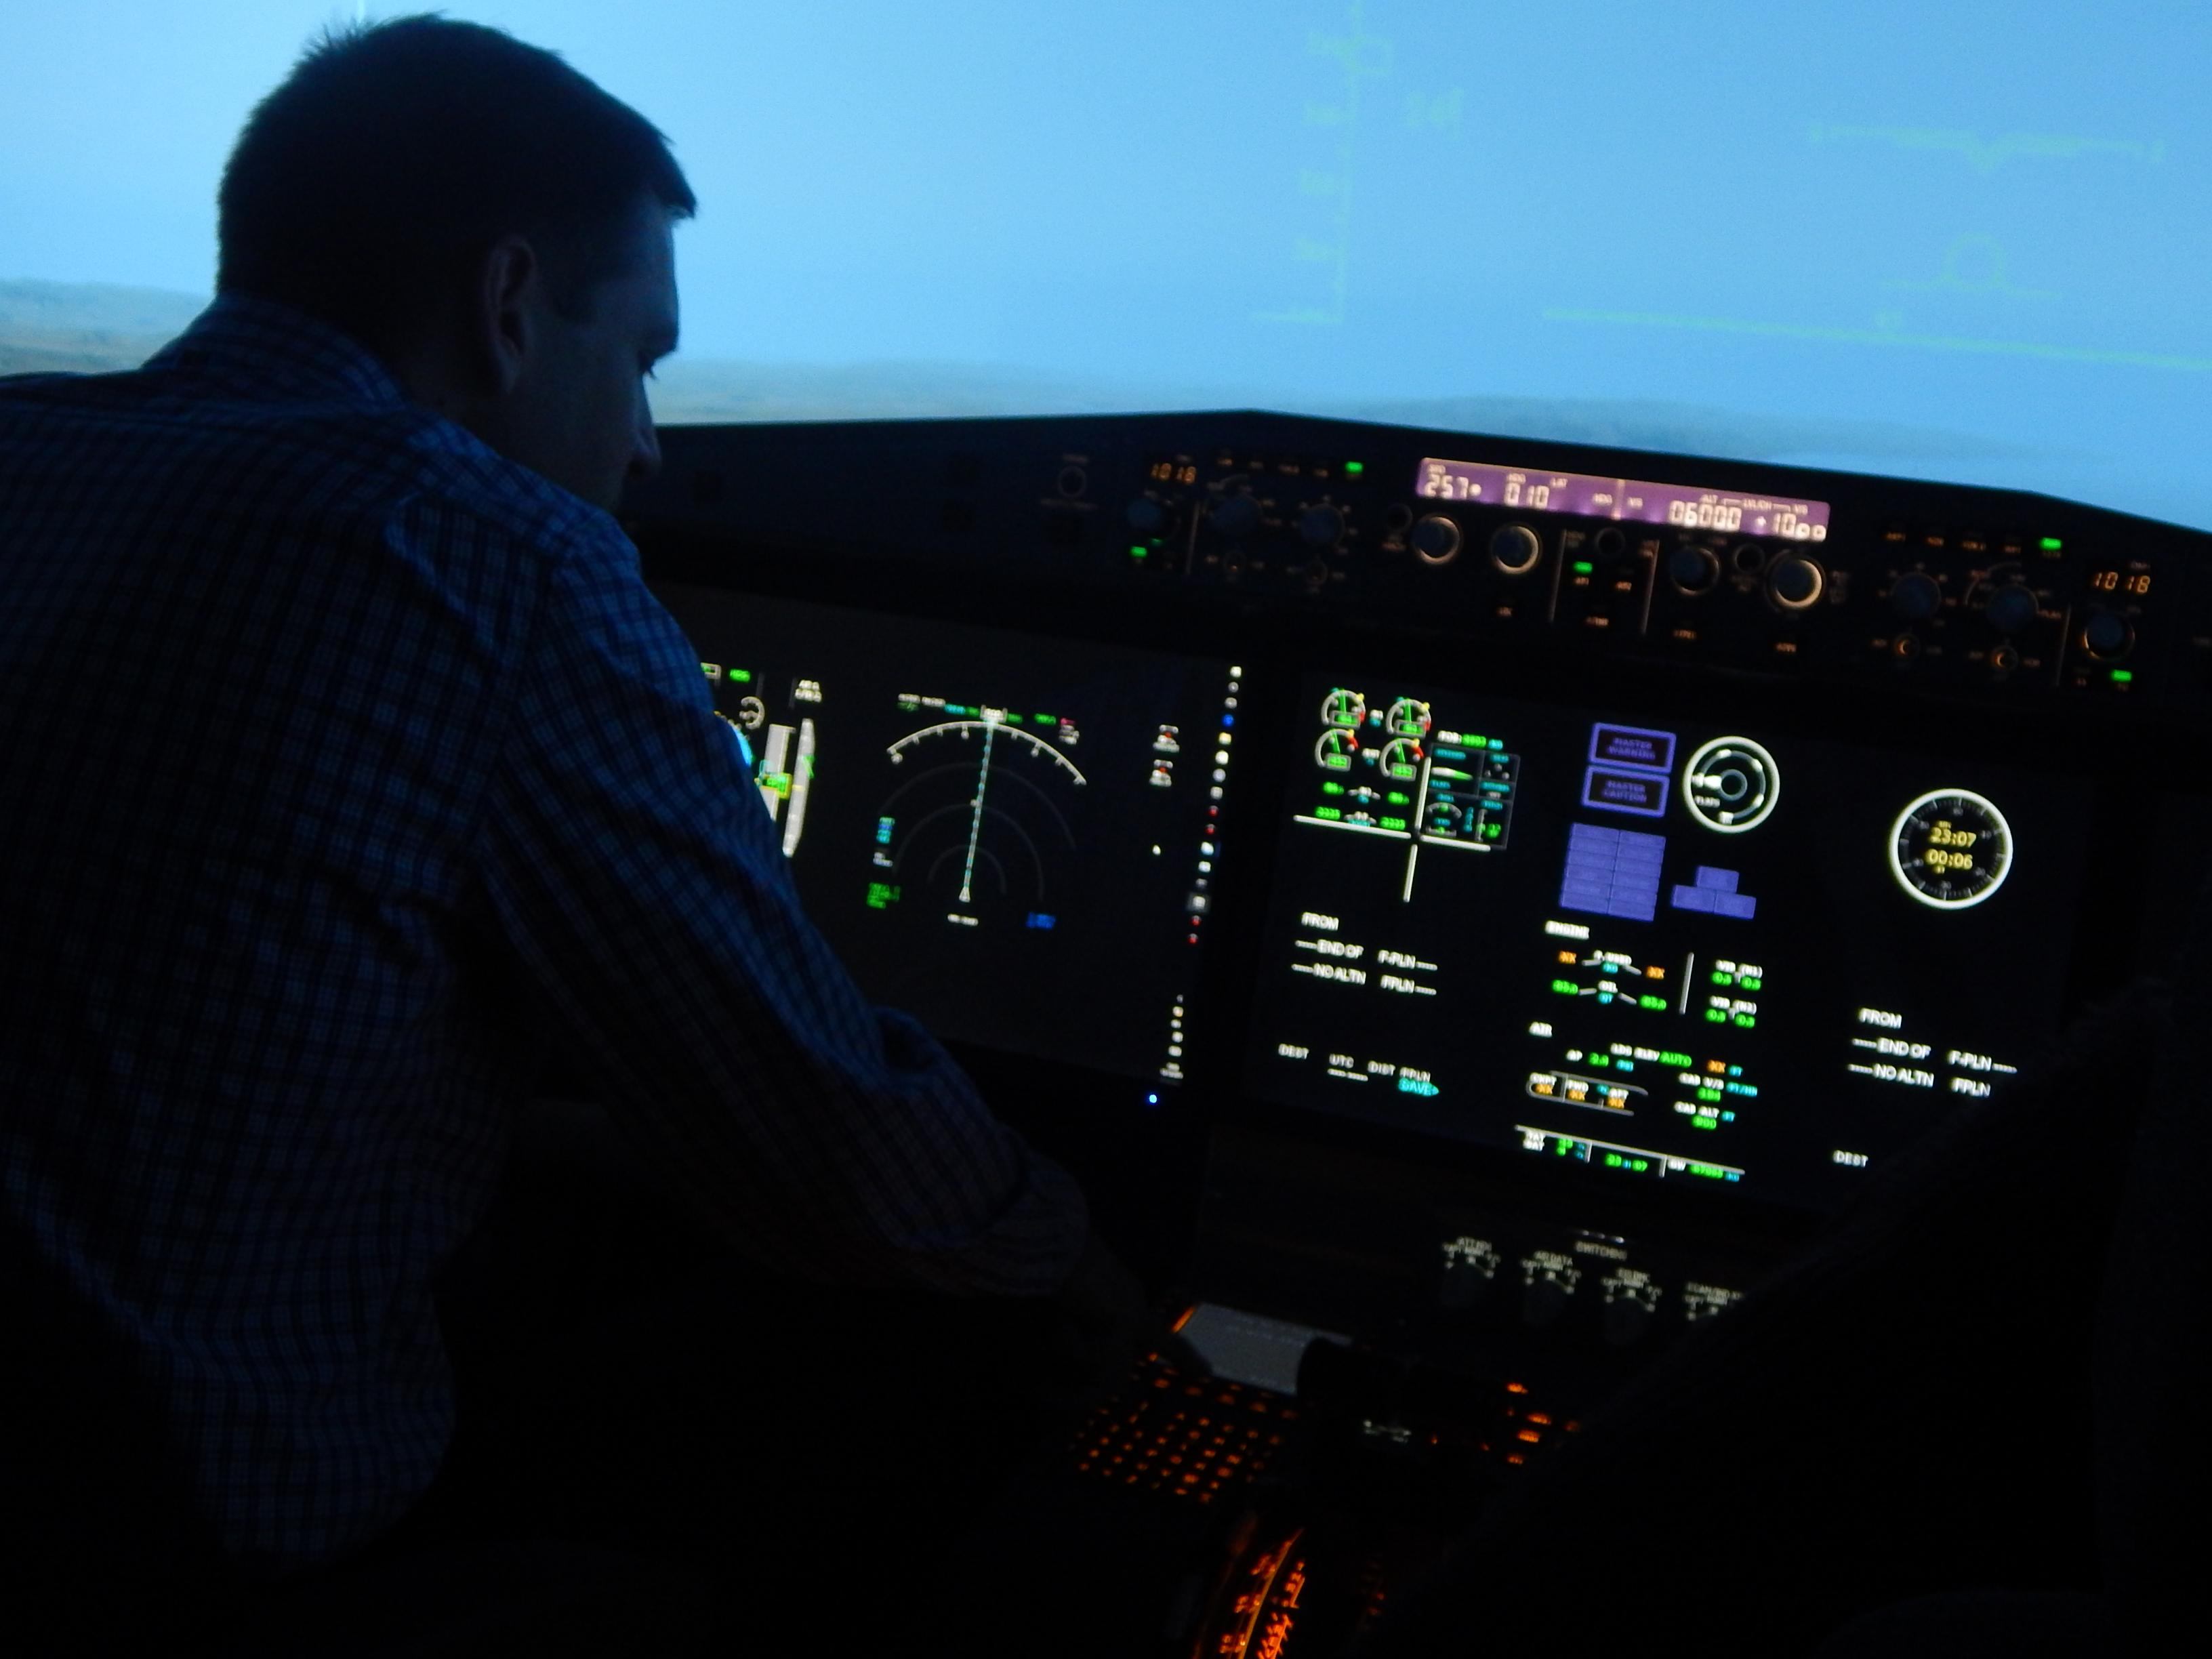 ATPL simulator